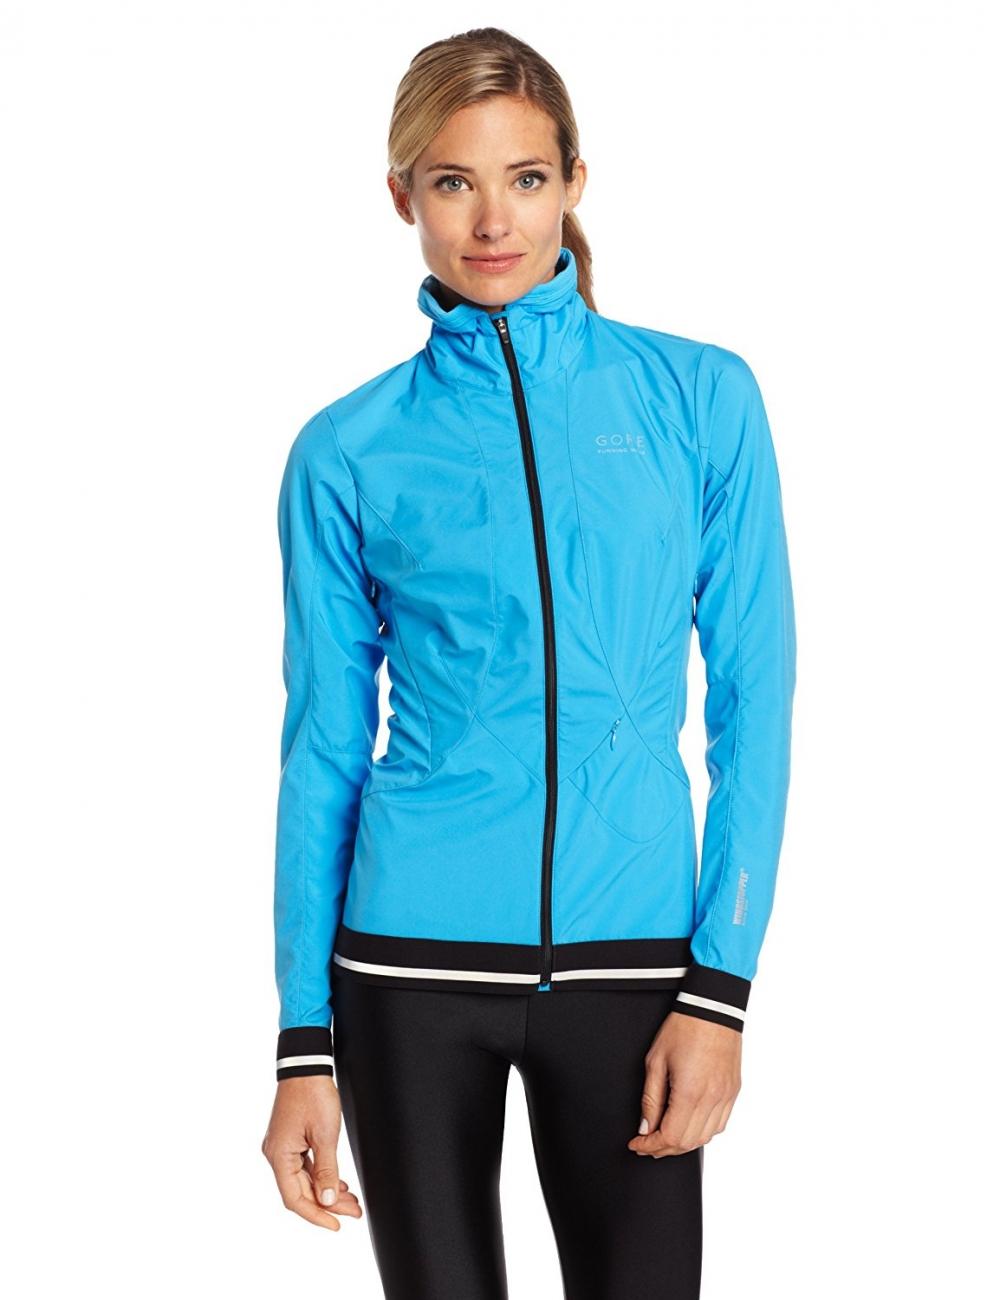 Куртка GORE Running Wear Air 2.0 Windstopper Active Shell Jacket (размер XL(реально L/M)) - 2